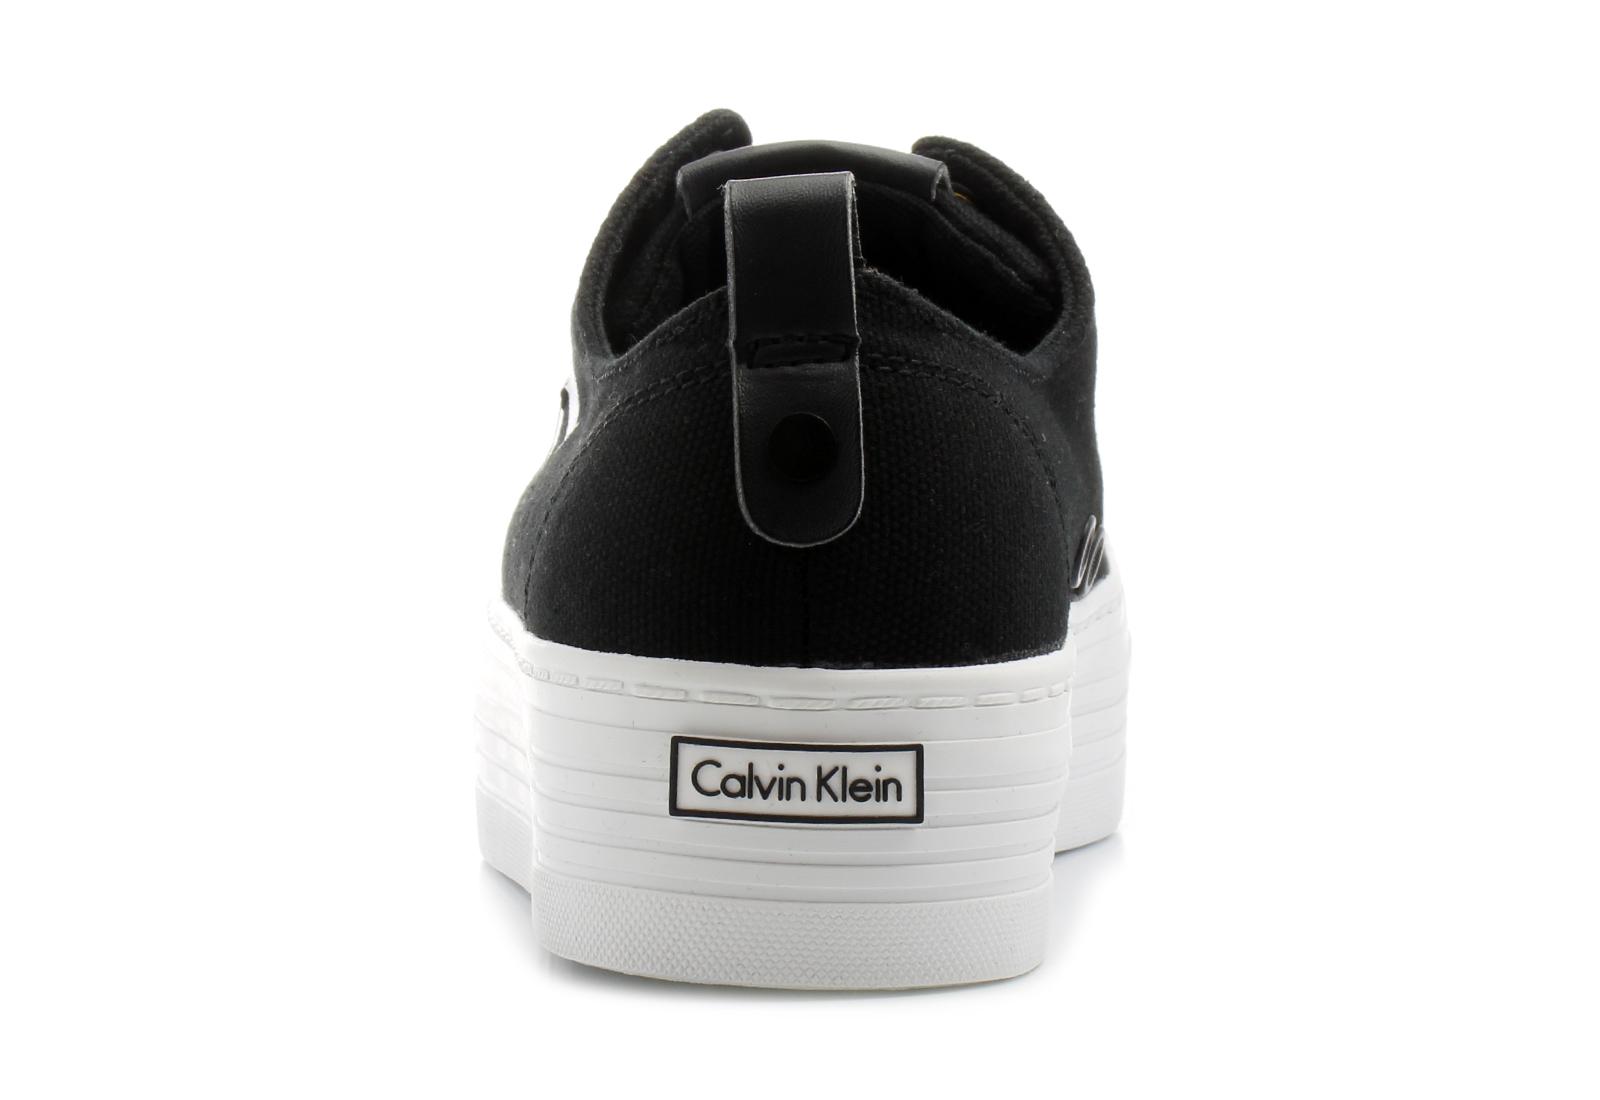 d5429cb4d2 Calvin Klein Jeans Casual Crna Patike - Zolah - Office Shoes ...